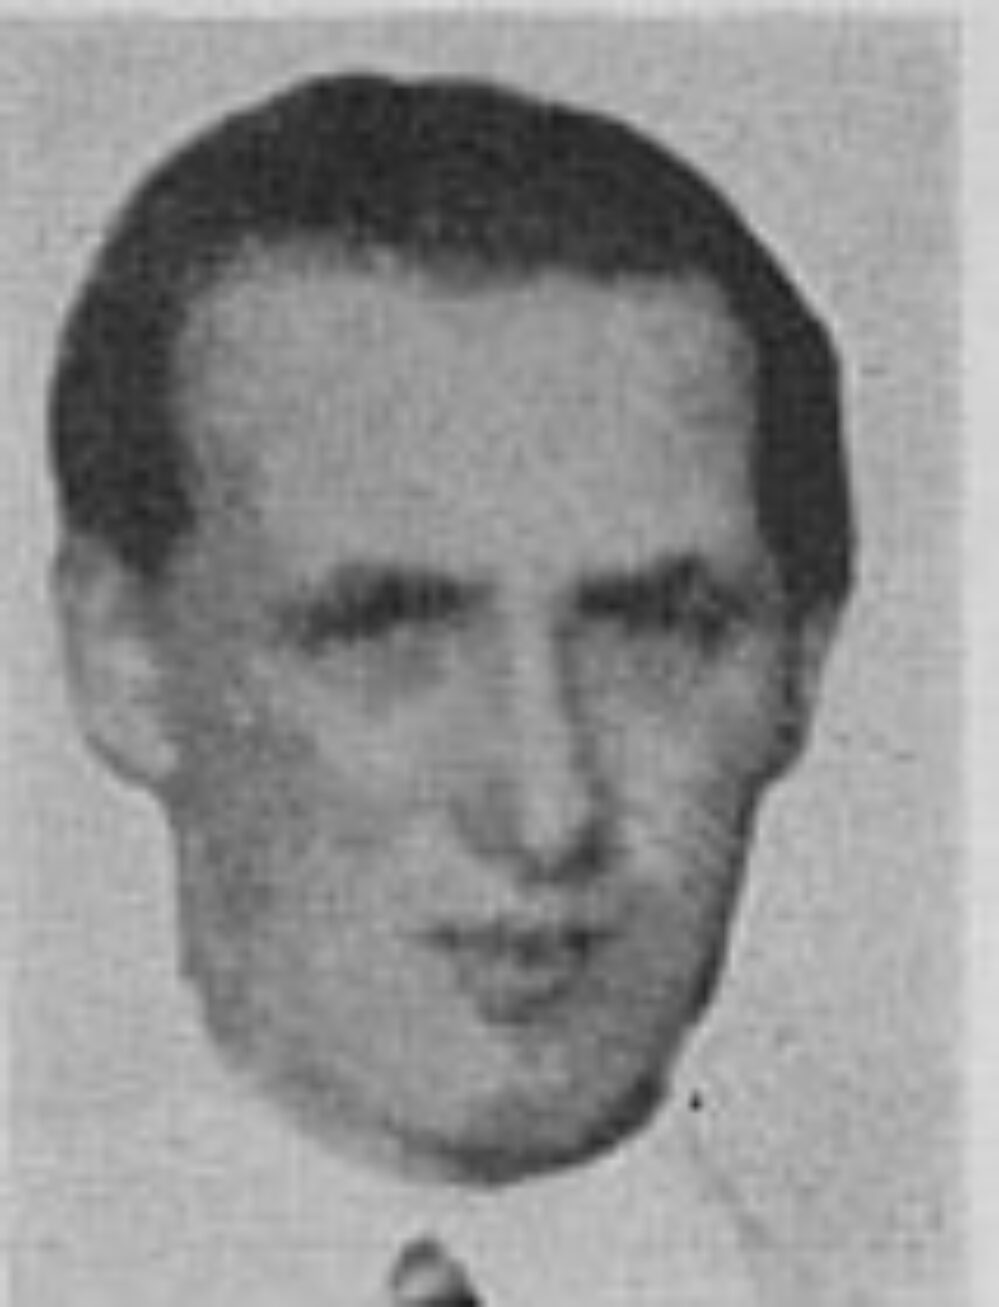 Karl Knutsen Fossbakk